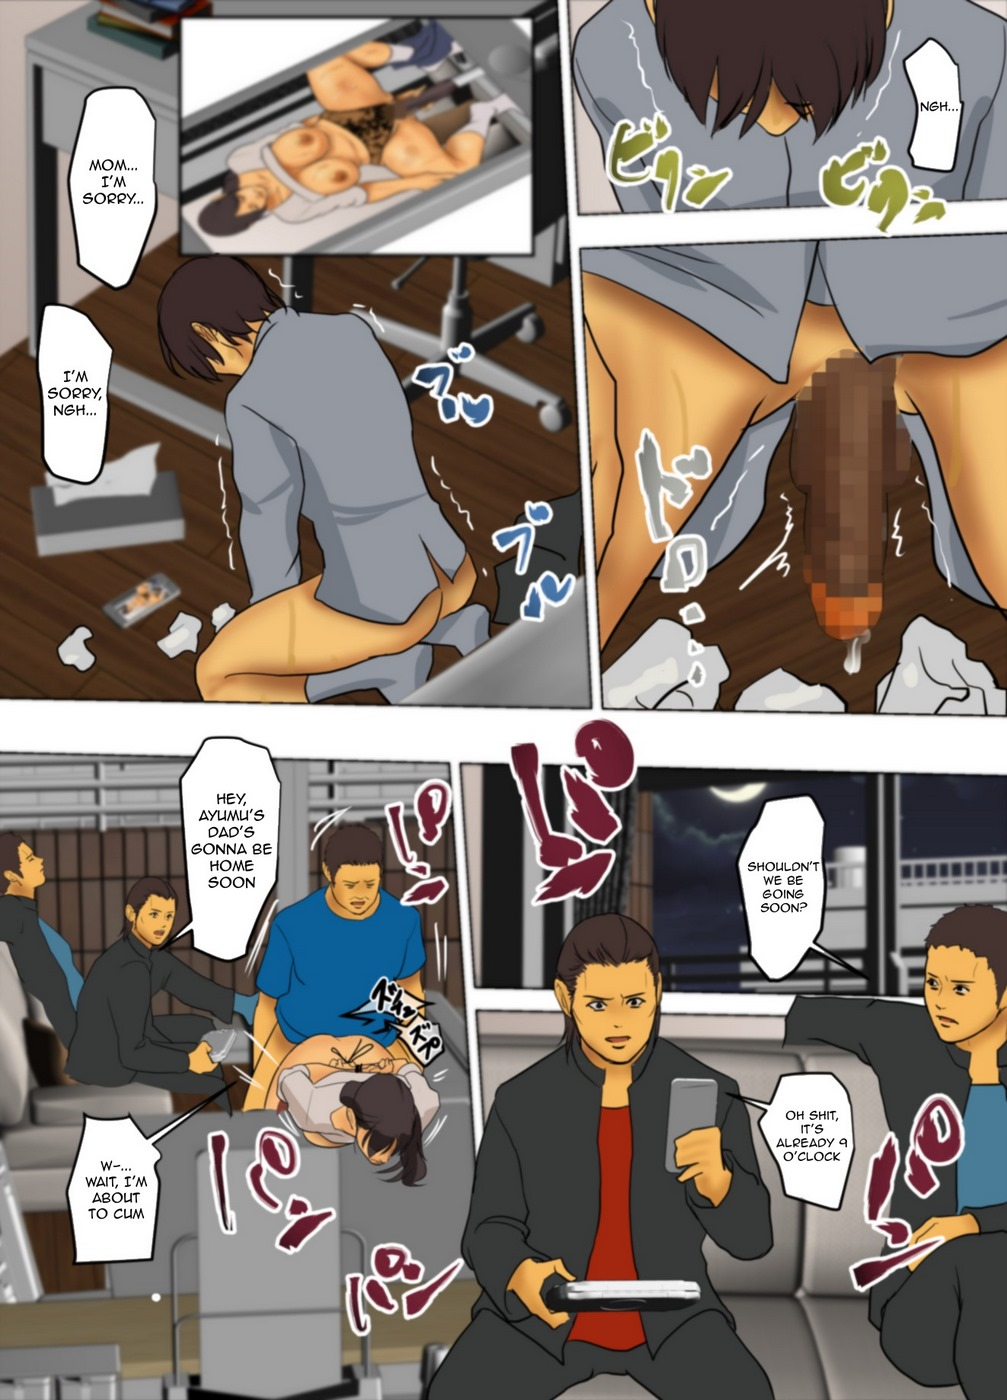 Sacrificial Mother 2- Hentai - part 6